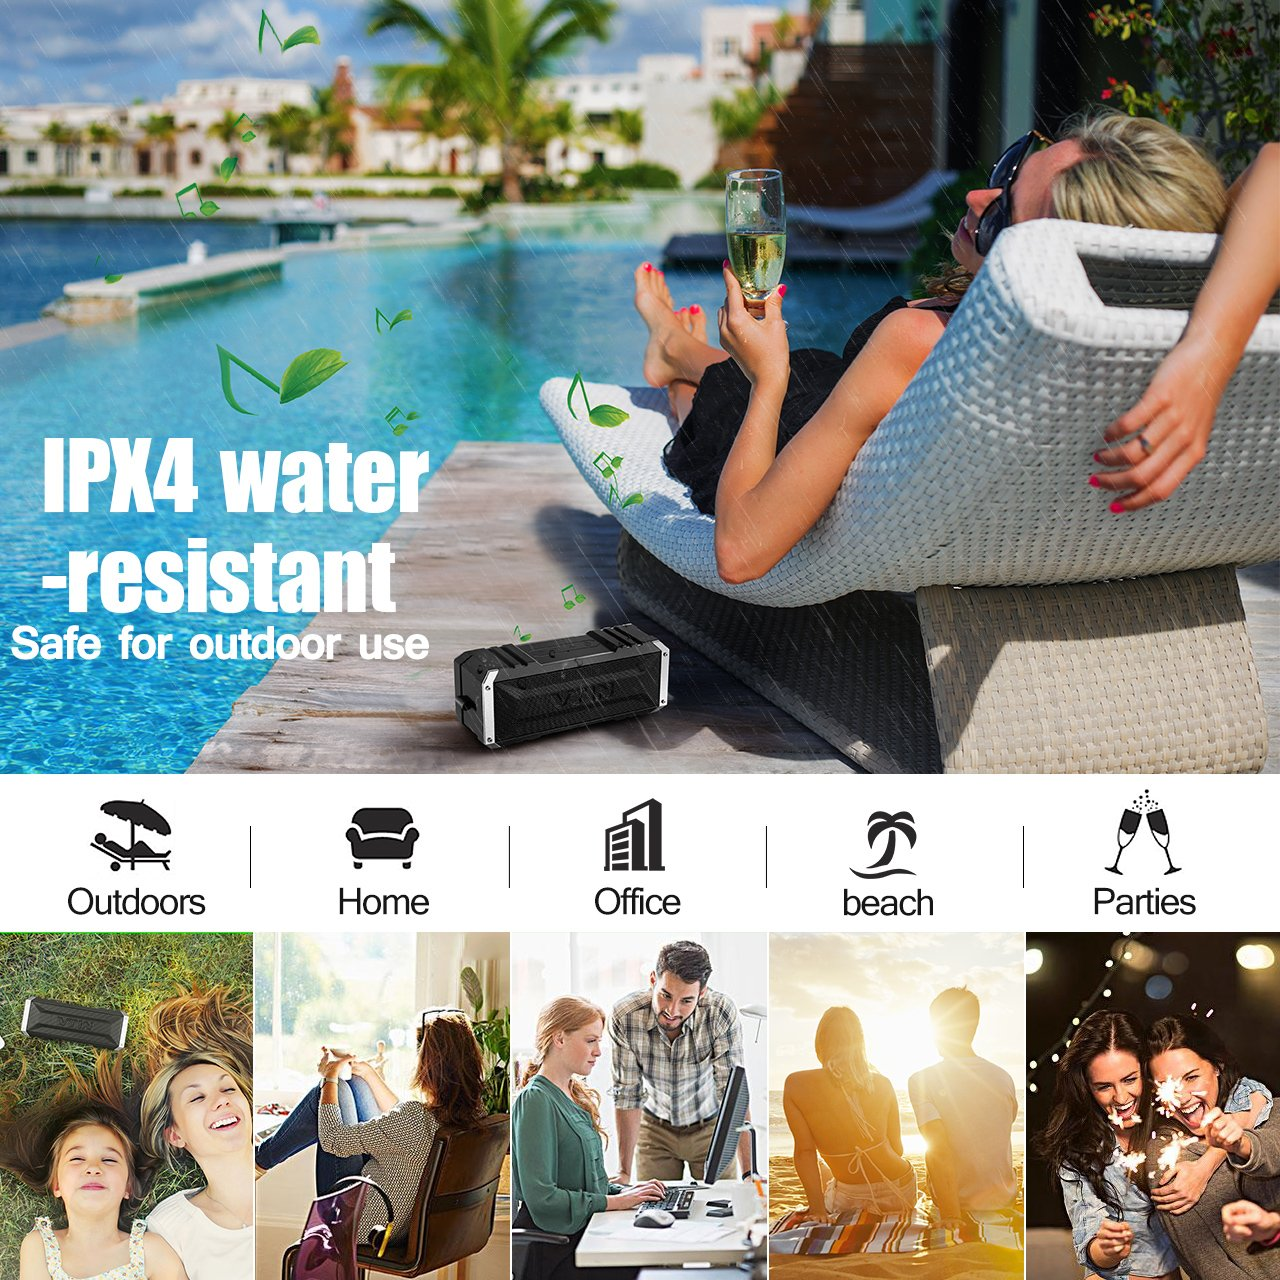 Vtin 20W Outdoor Bluetooth Speaker, Loud Volume, 30 Hours Playtime Portable Wireless Speaker, Waterproof, Dustproof, Shockproof for Indoor and Outdoor Activities - Shower, Pool, Beach, Car, Home by Vtin (Image #6)